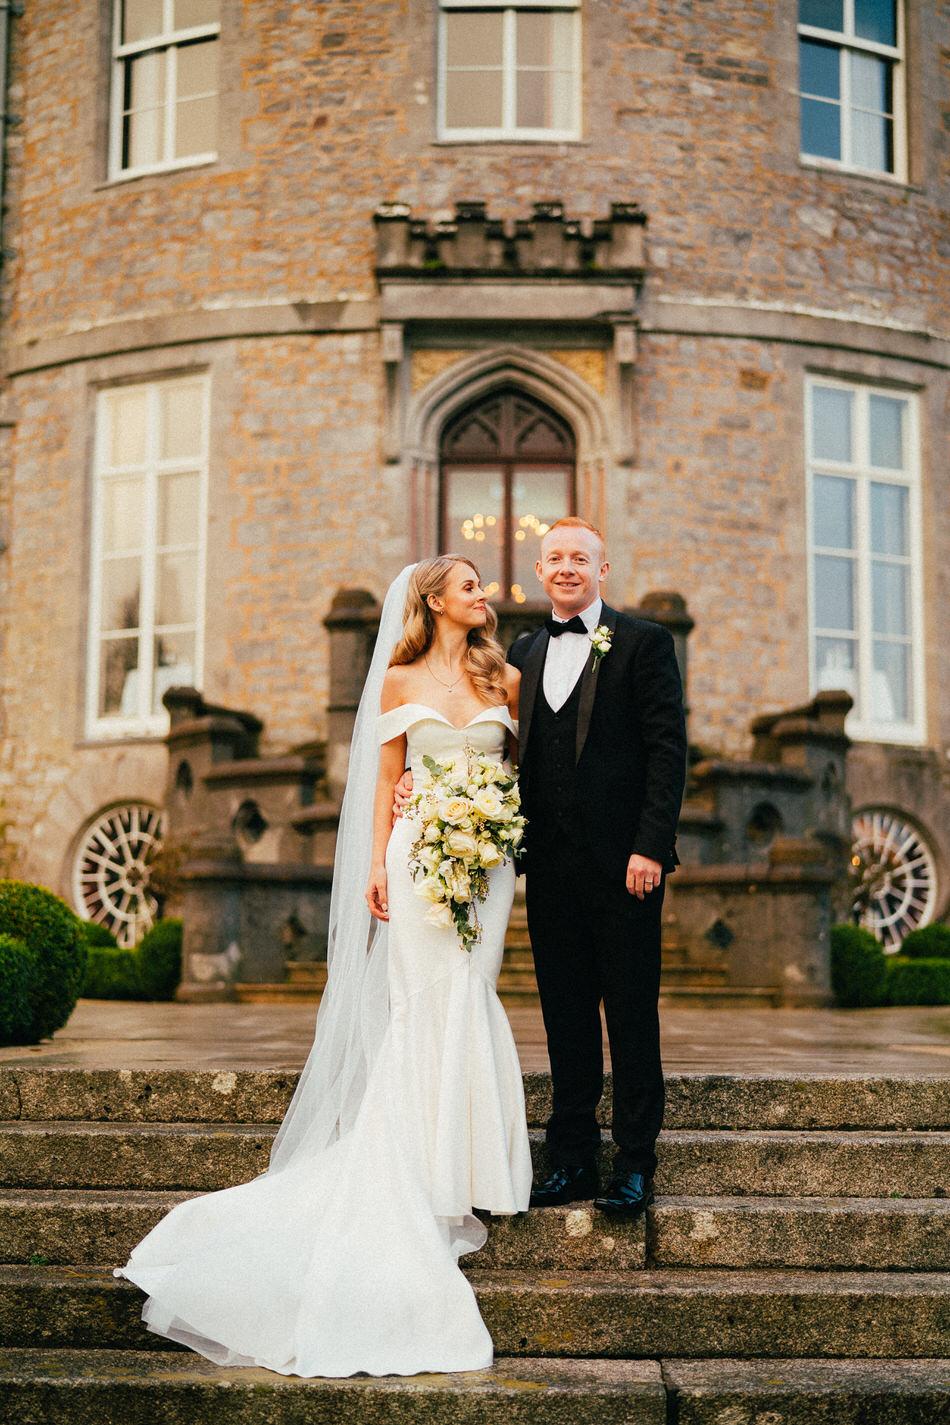 Castle-wedding-ireland-photos- 0187 133